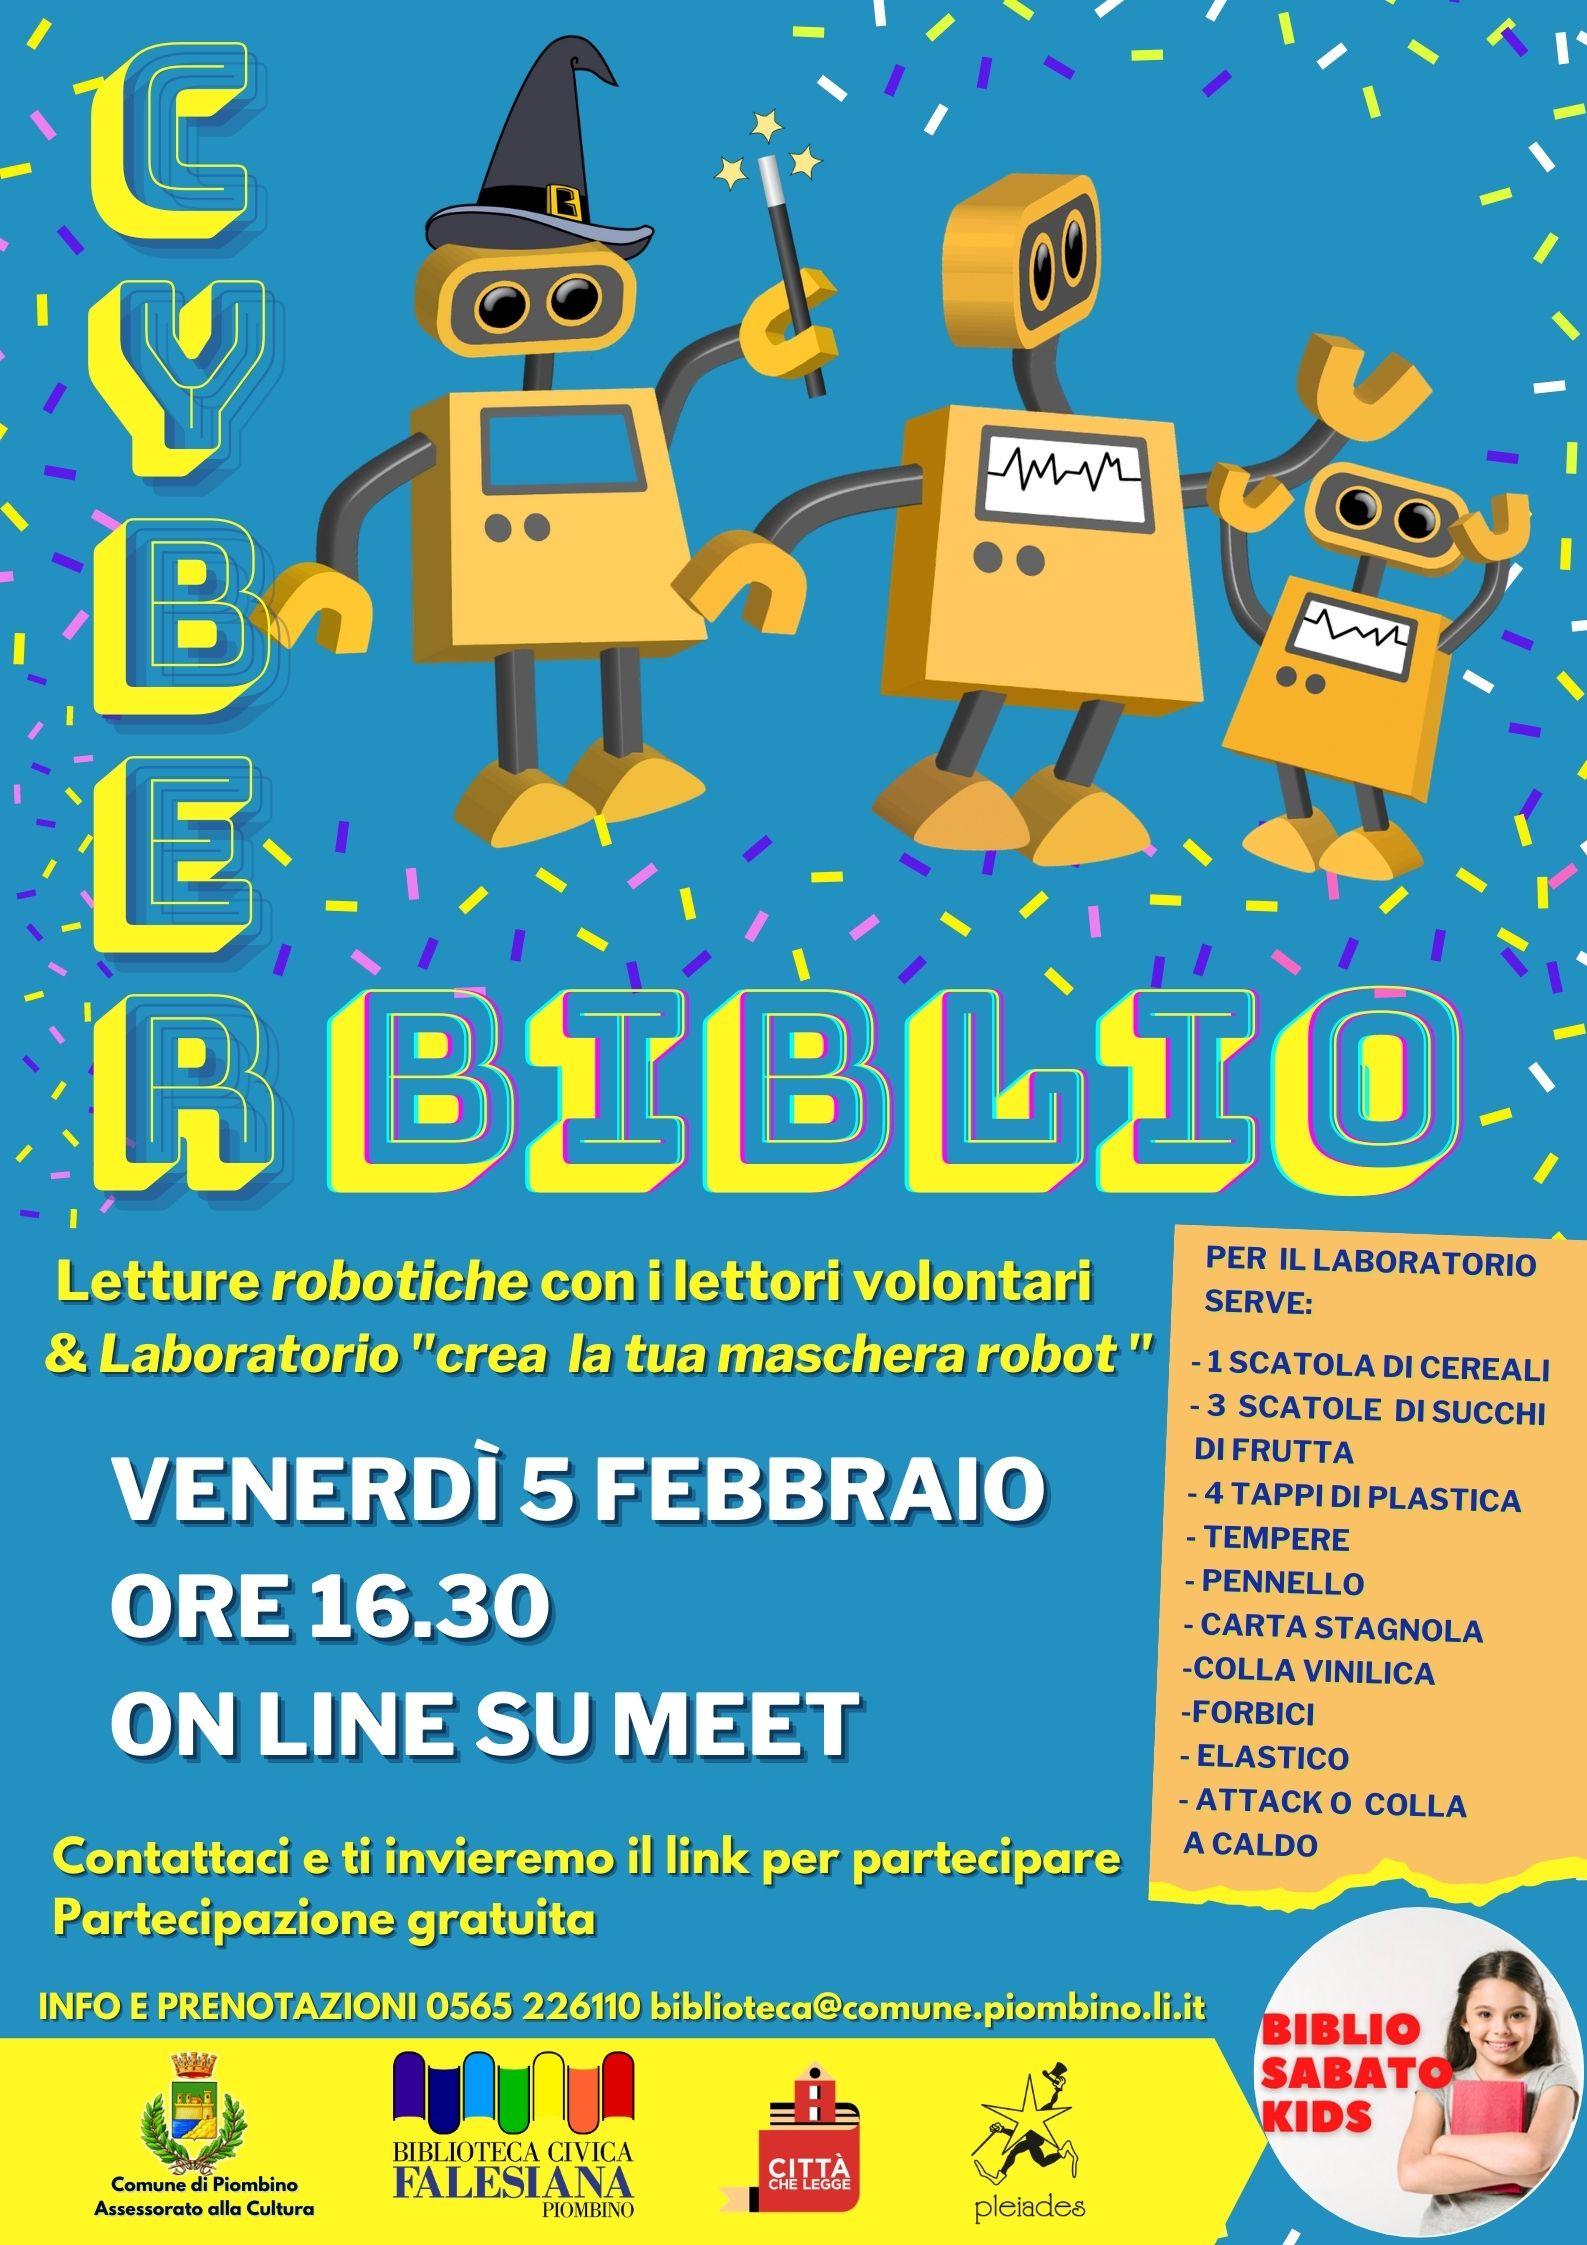 Venerdì 4 febbraio la Bibllioteca diventa Cyber